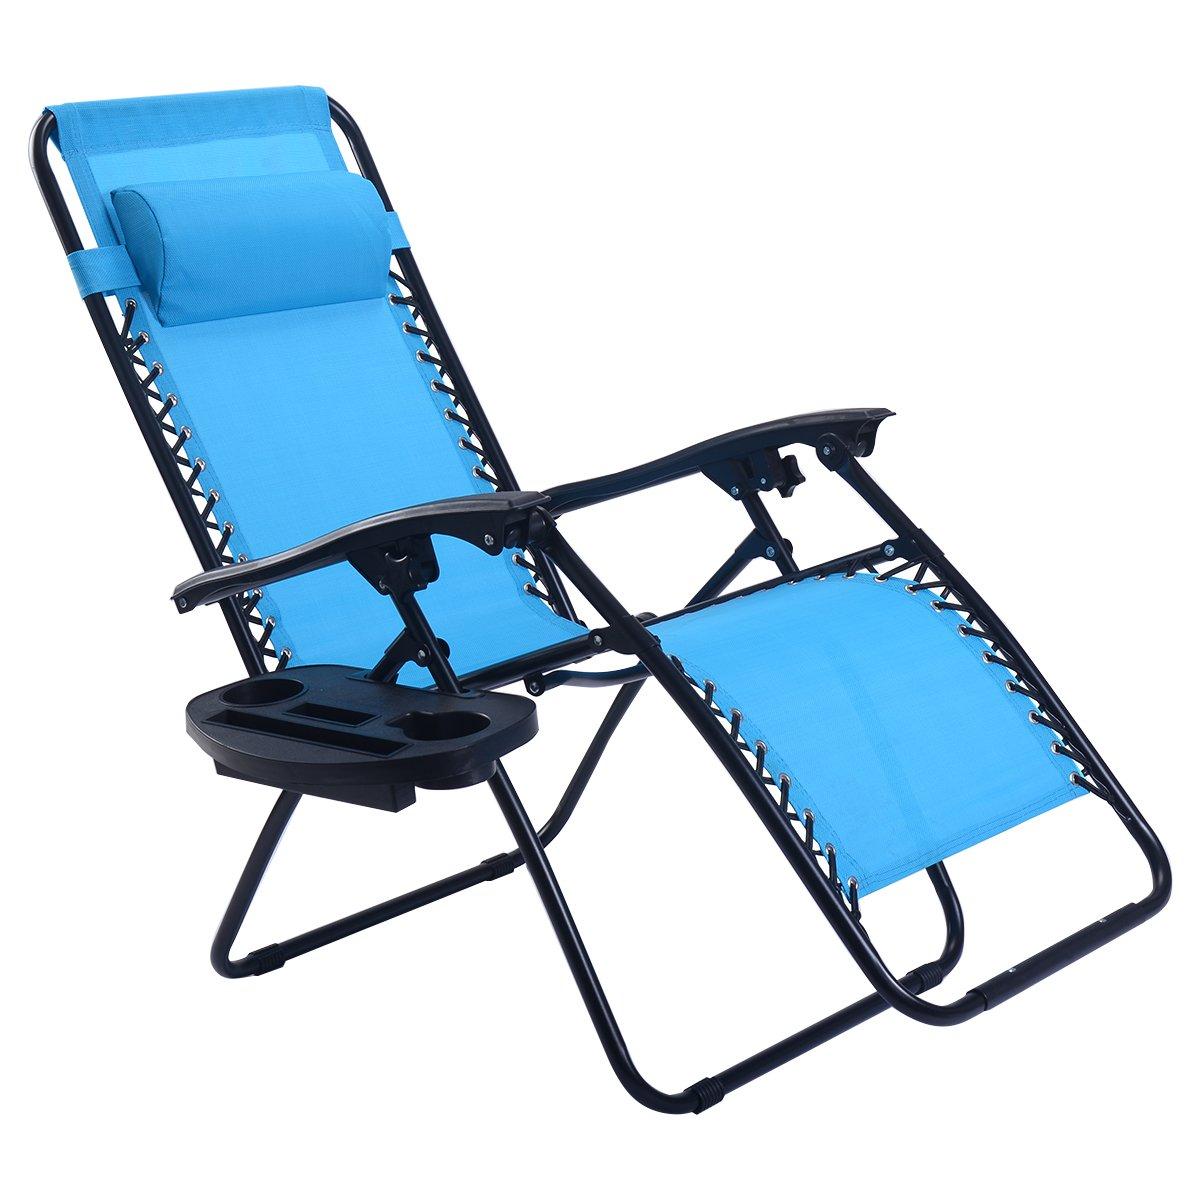 Goplus Folding Zero Gravity Reclining Lounge Chairs Outdoor Beach Patio W/Utility Tray (Light Blue)